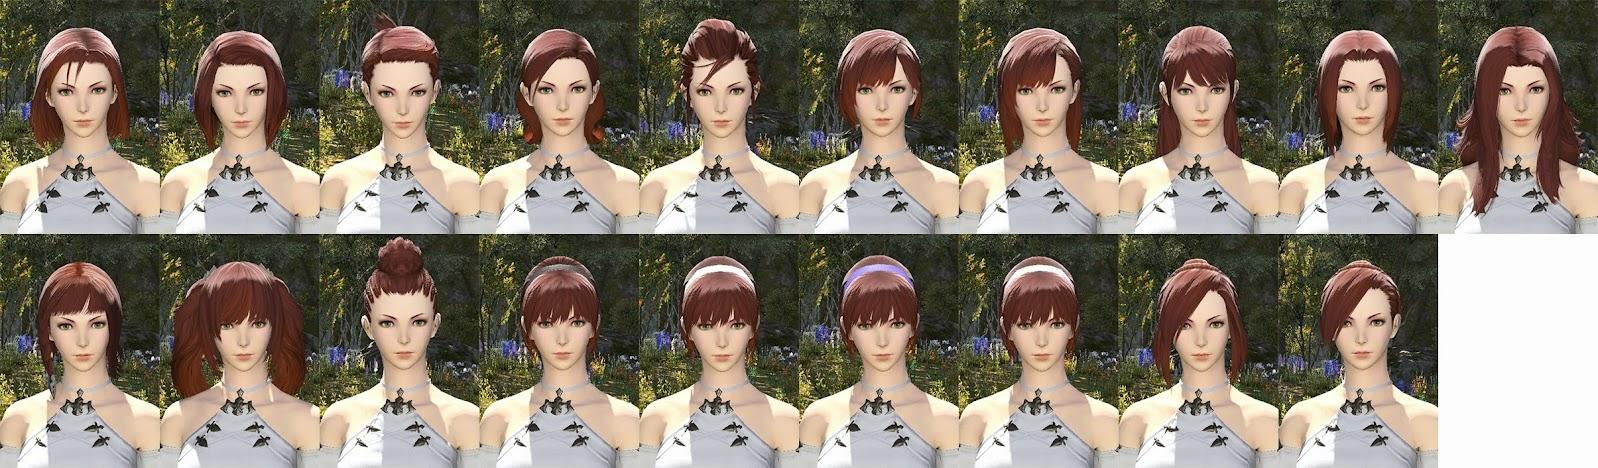 Final fantasy xiv hyur female - photo#6